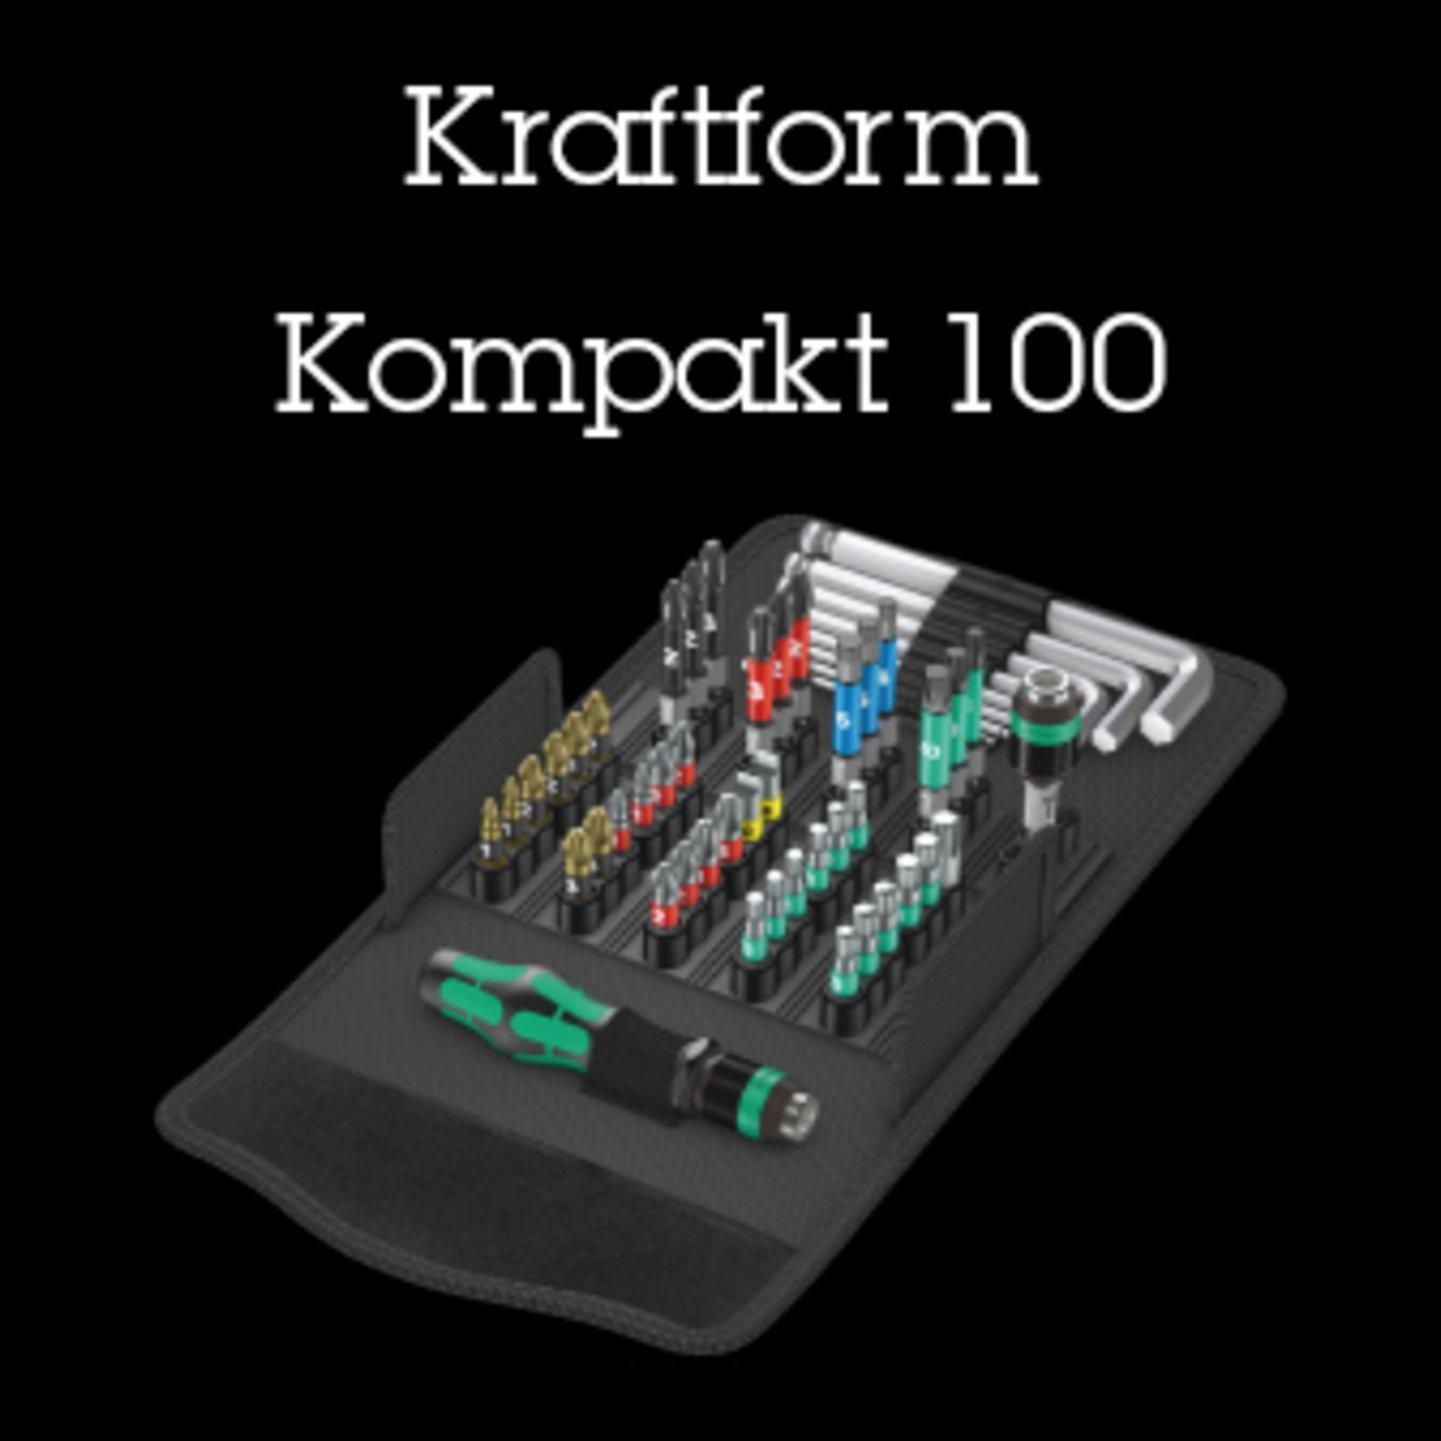 Kraftform Kompakt 100